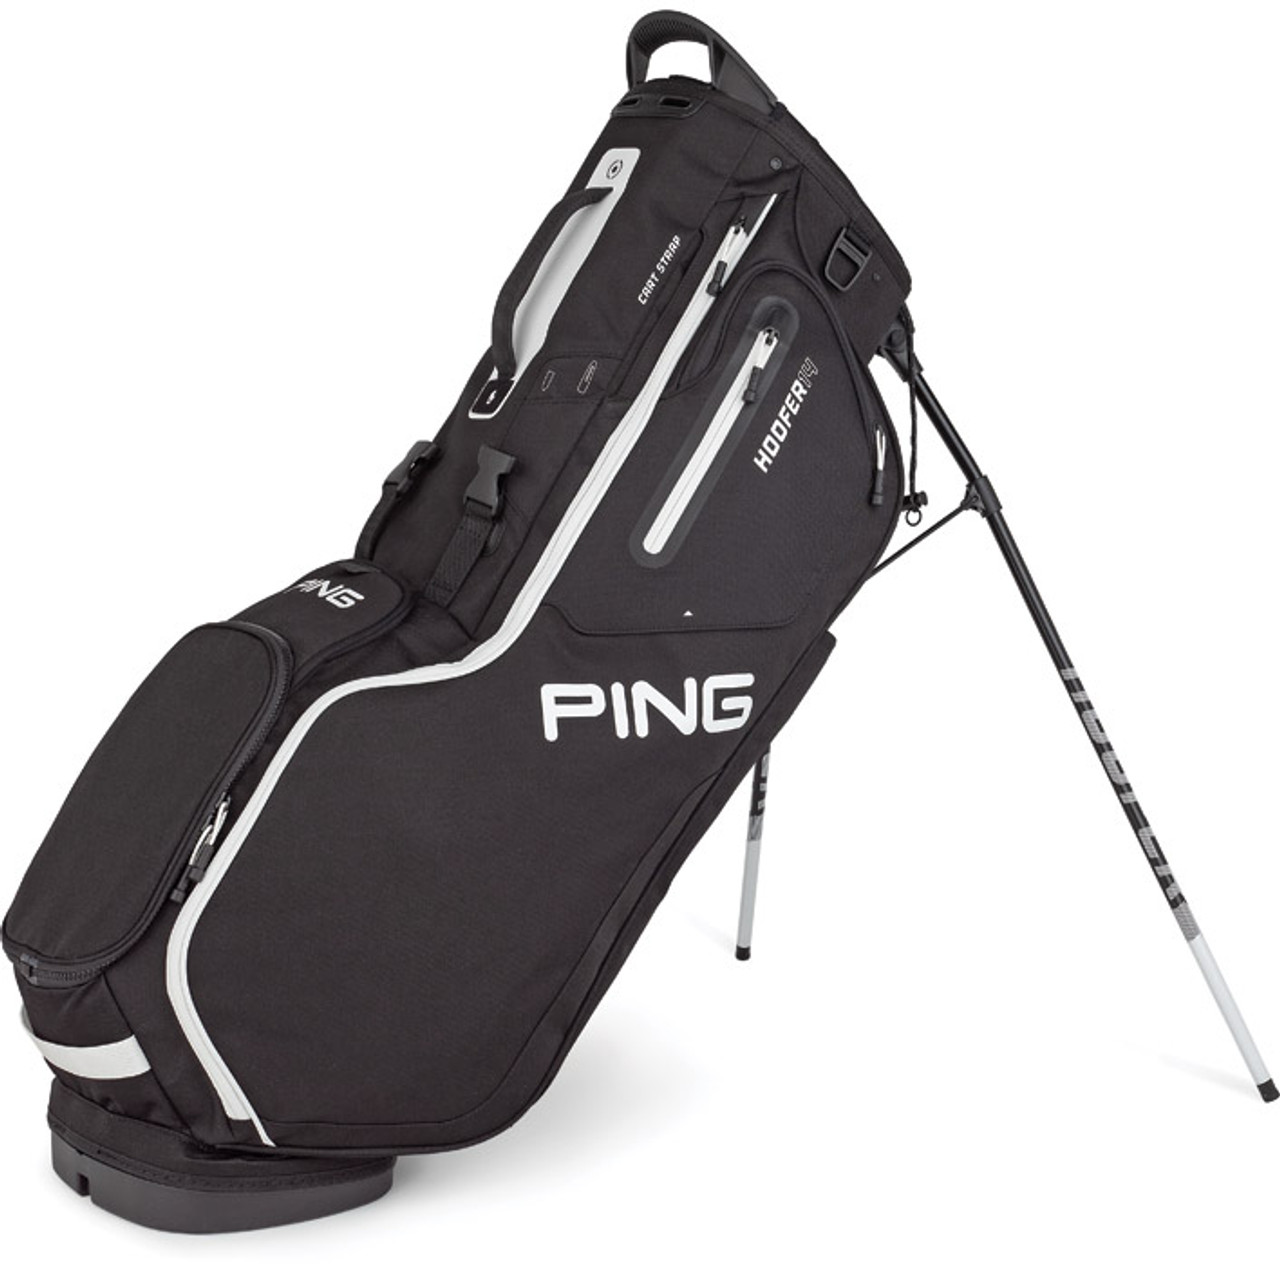 Ping Hoofer 14 Stand Bag - Black